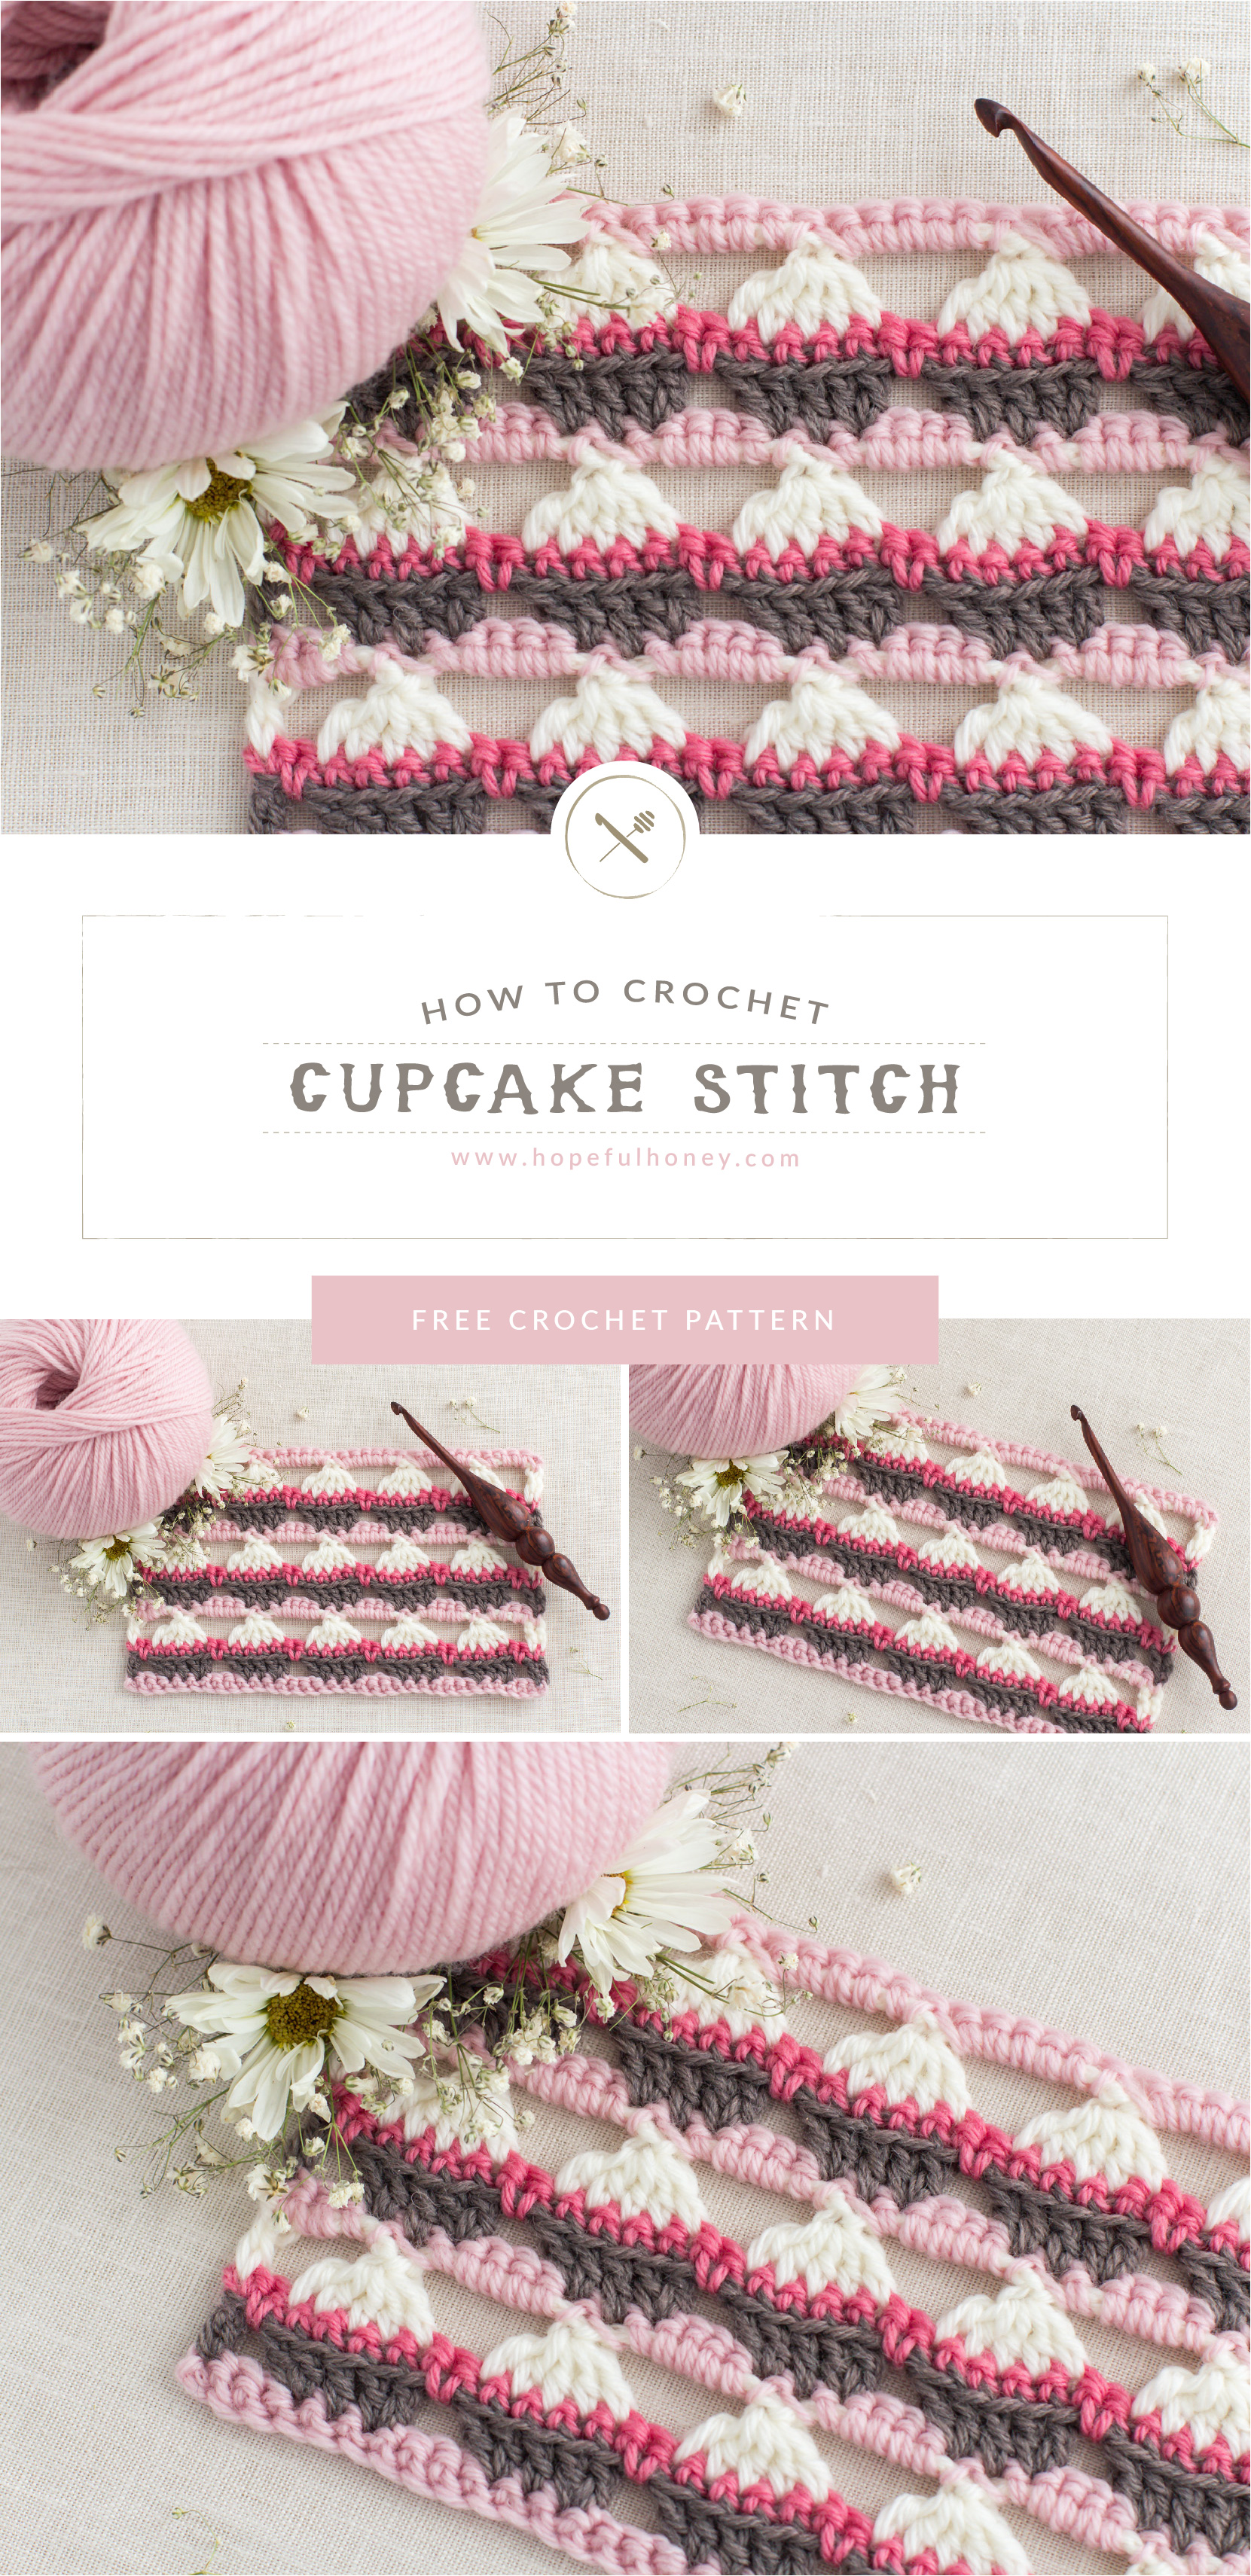 Cupcake Stitch Free Crochet Pattern And Video Tutorial